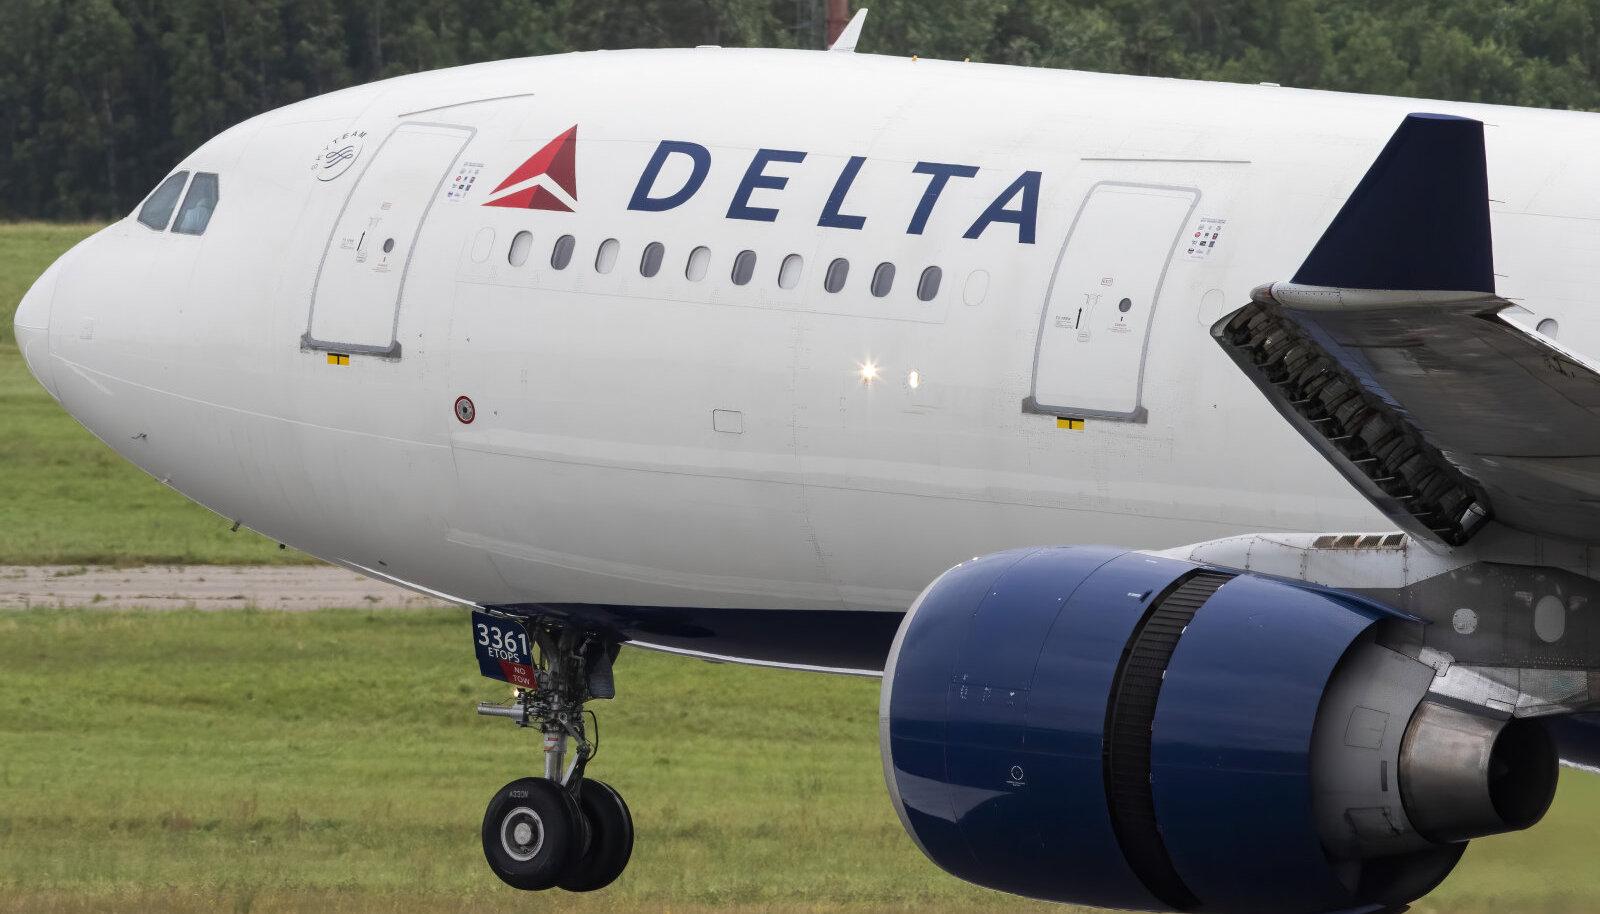 USA lennufirma Delta Airbus 330.